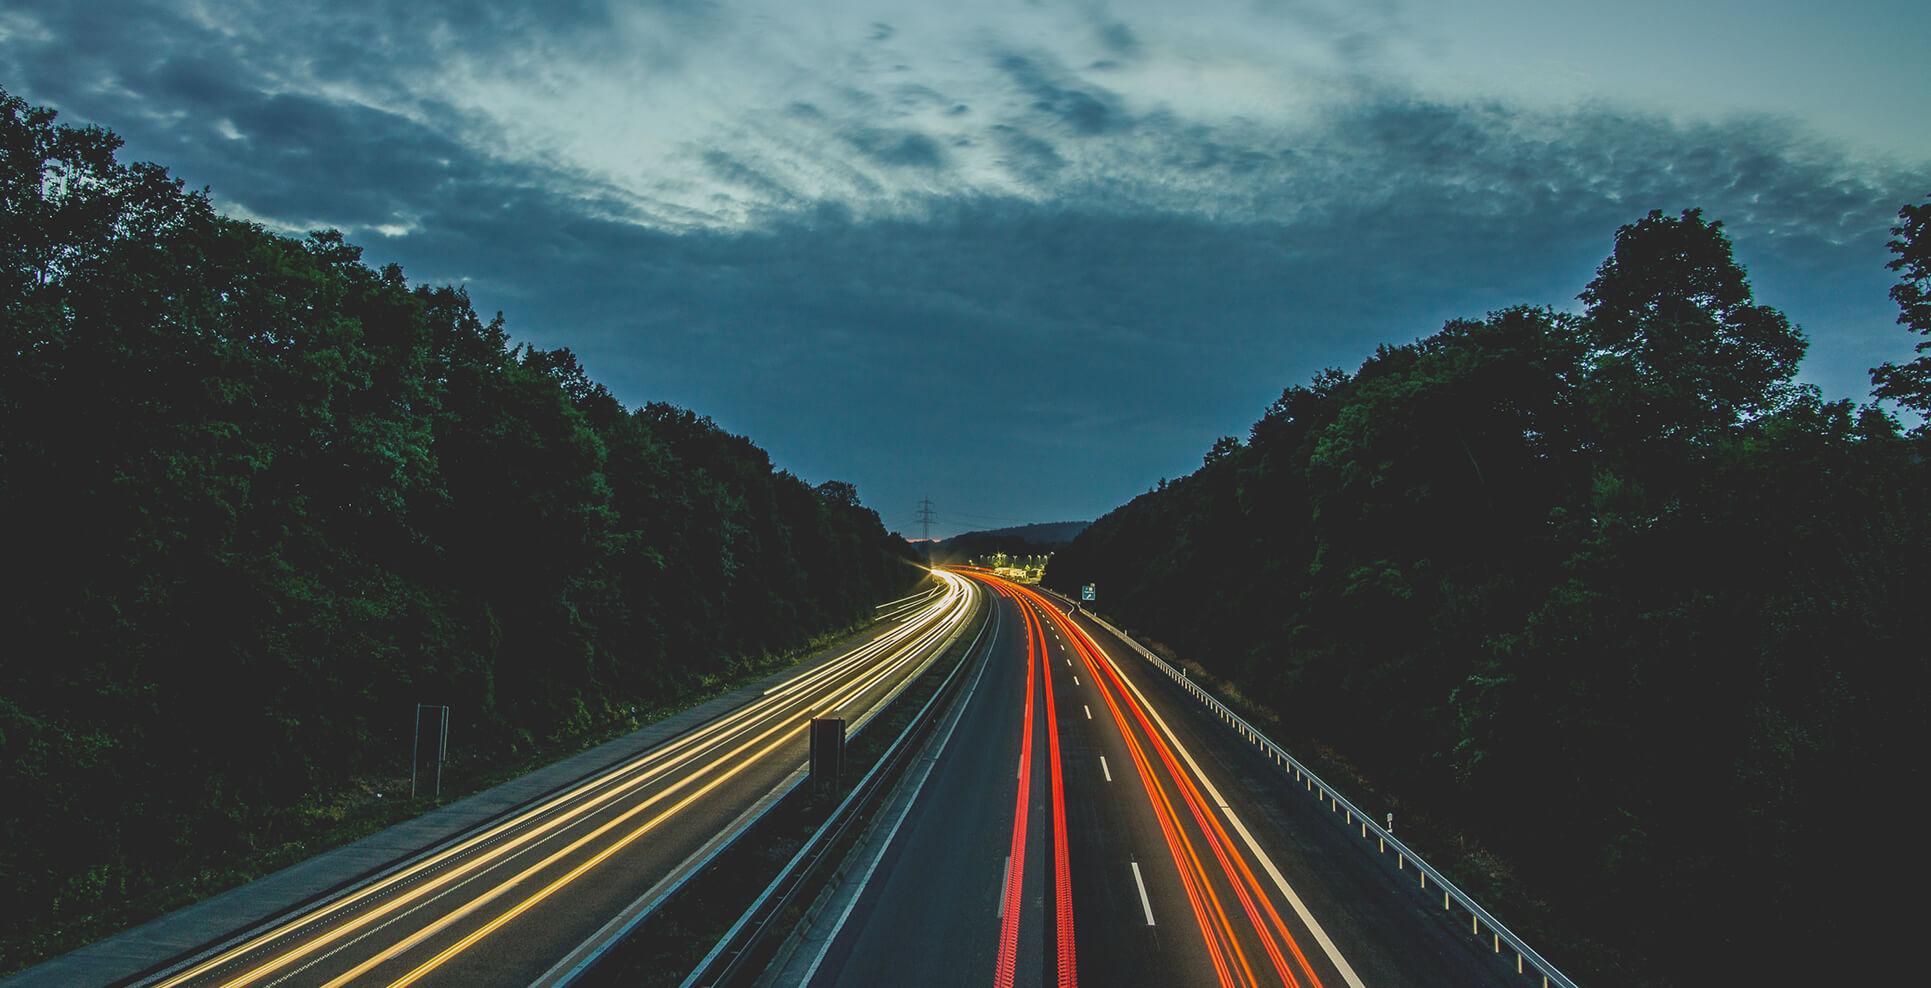 lecerclebleu-night-road.jpg